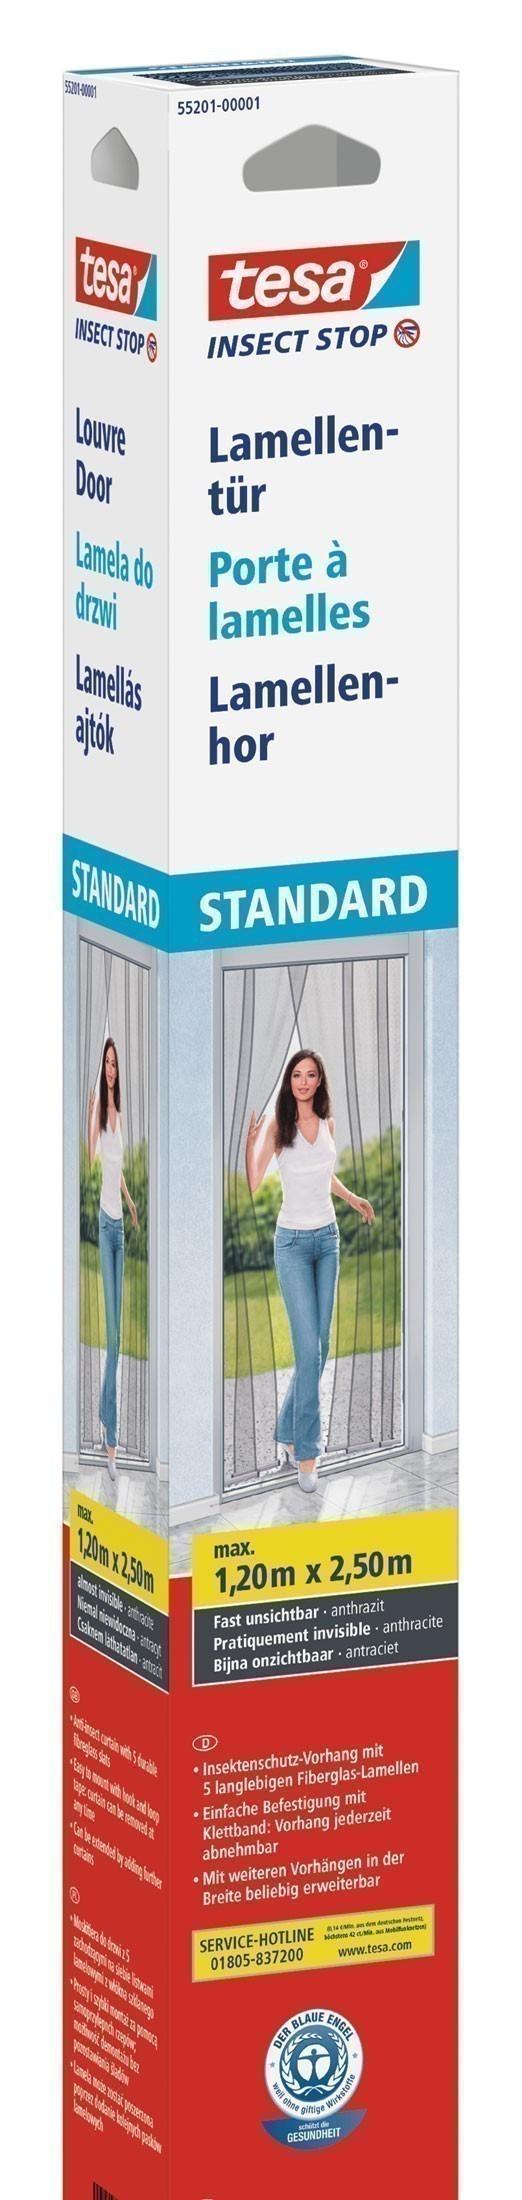 tesa insect stop fliegengitter lamellent r standard xl 1 2 m x 2 5 m bei. Black Bedroom Furniture Sets. Home Design Ideas